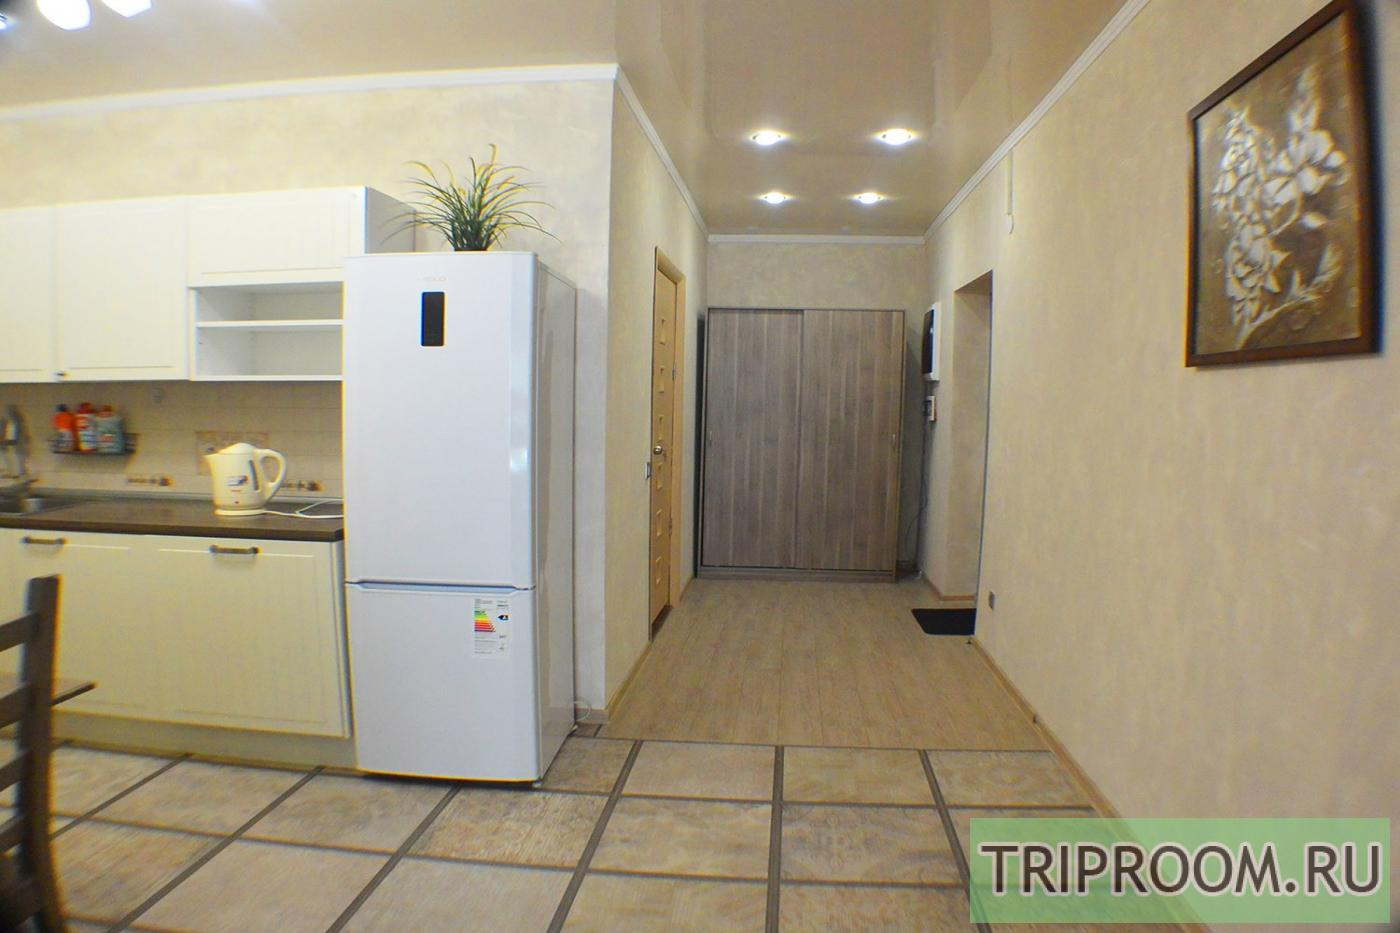 1-комнатная квартира посуточно (вариант № 26990), ул. Кирпичная улица, фото № 12